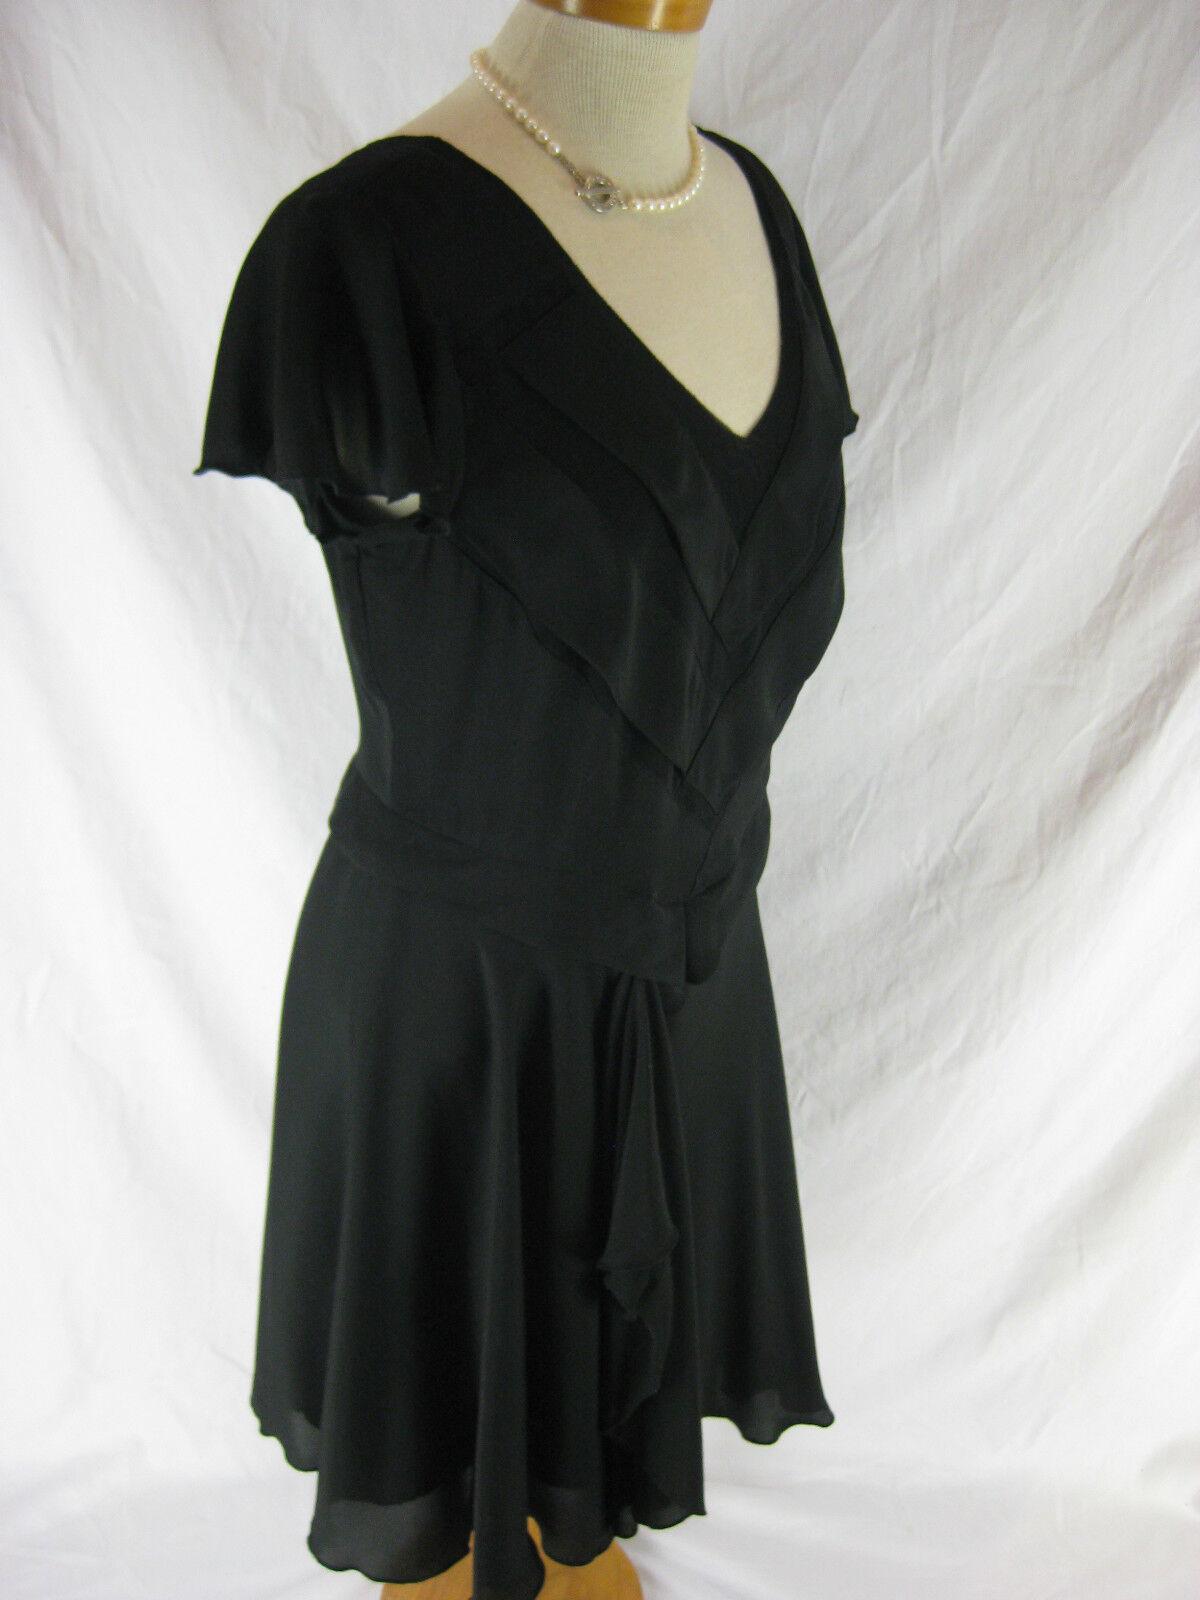 Größe 12 schwarz Tea style day dress by LEONA EDMISTON Main Line- Designer LBD